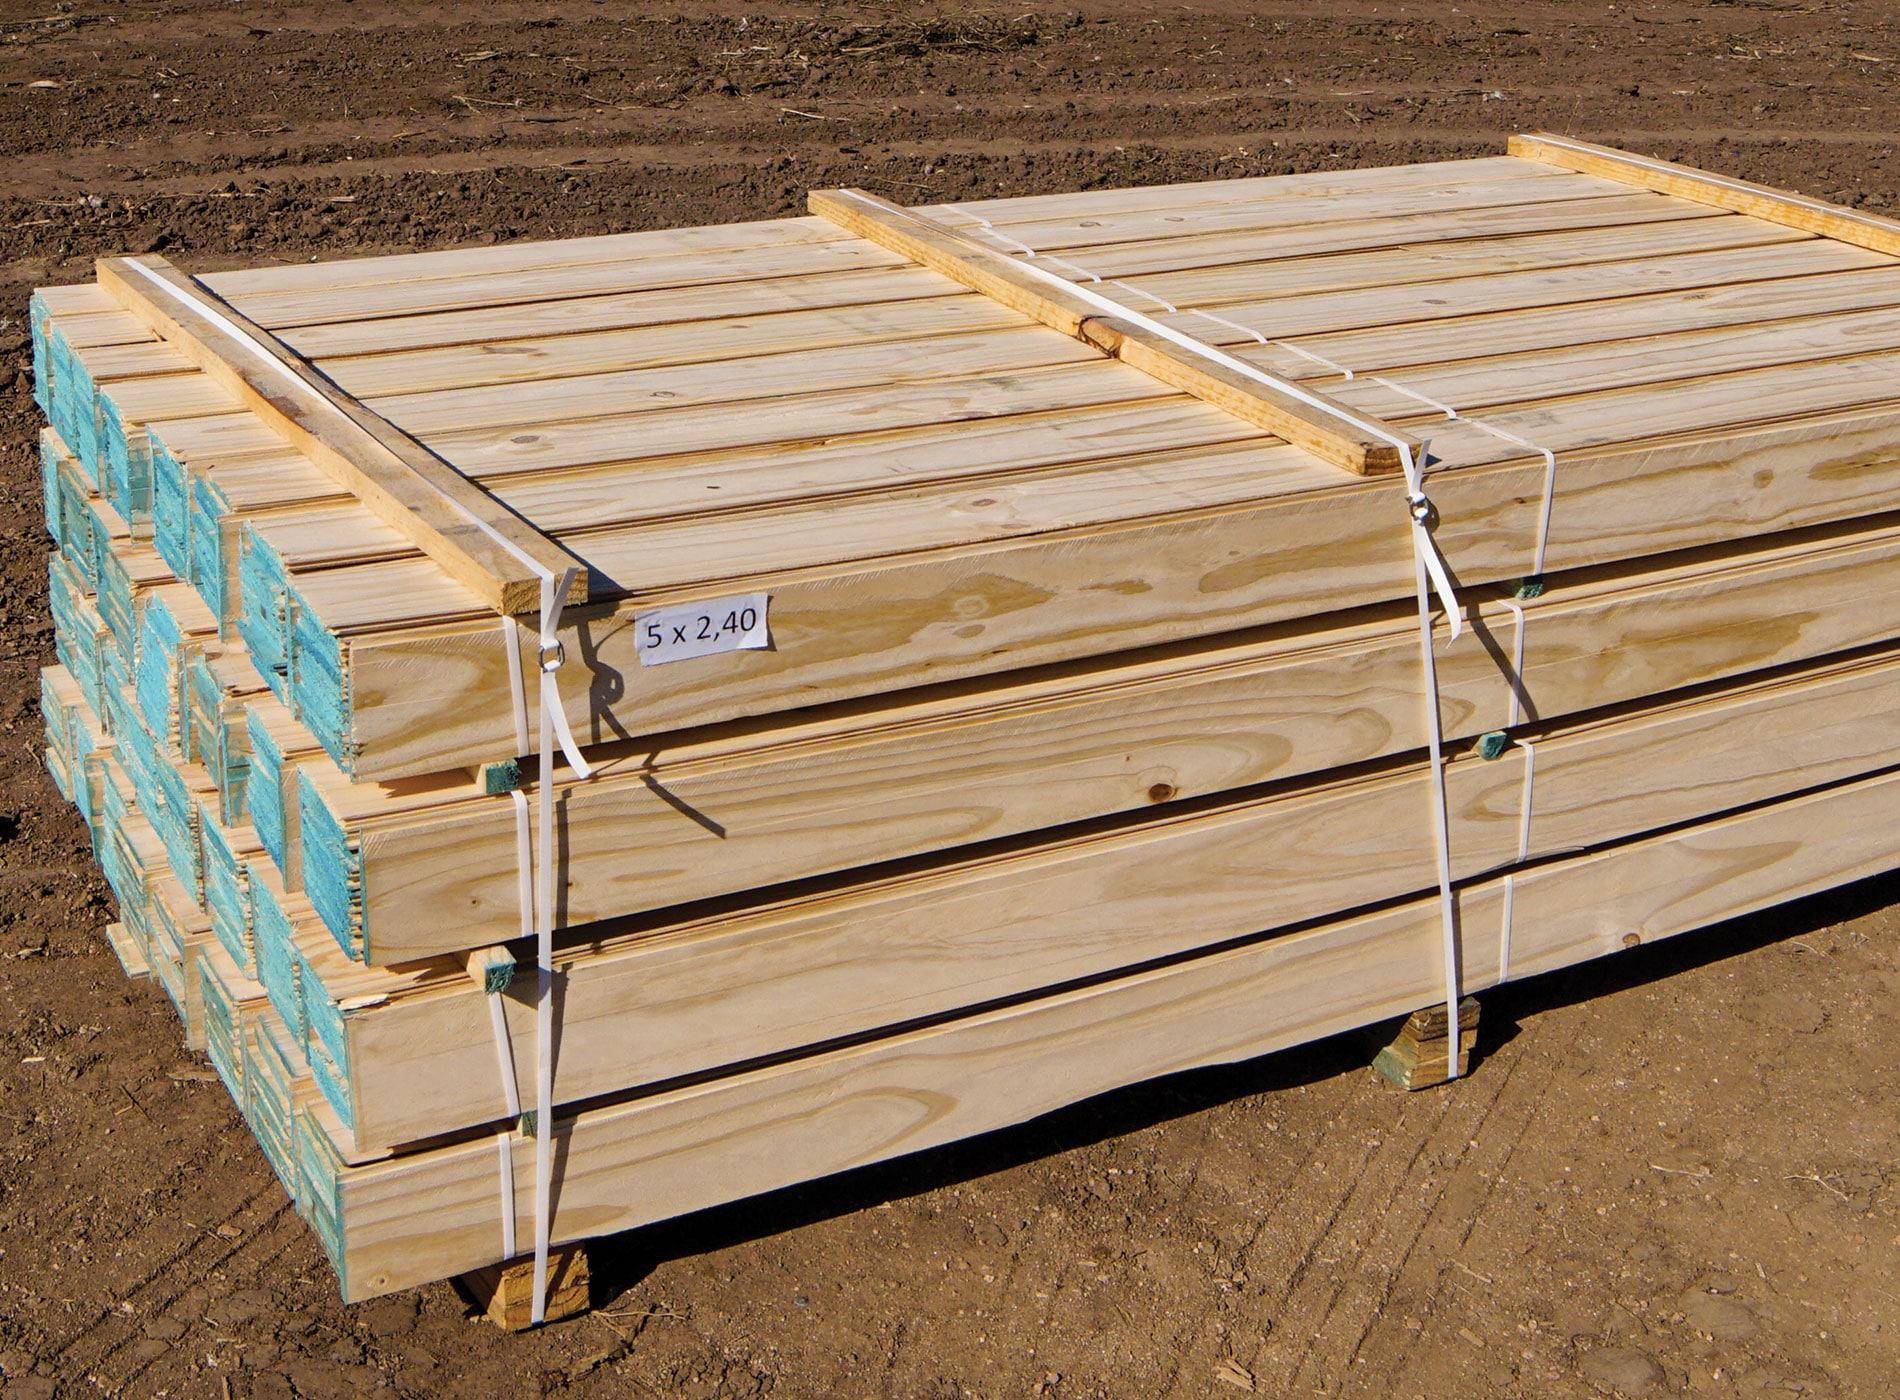 Tablas de madera para pisos machimbrada